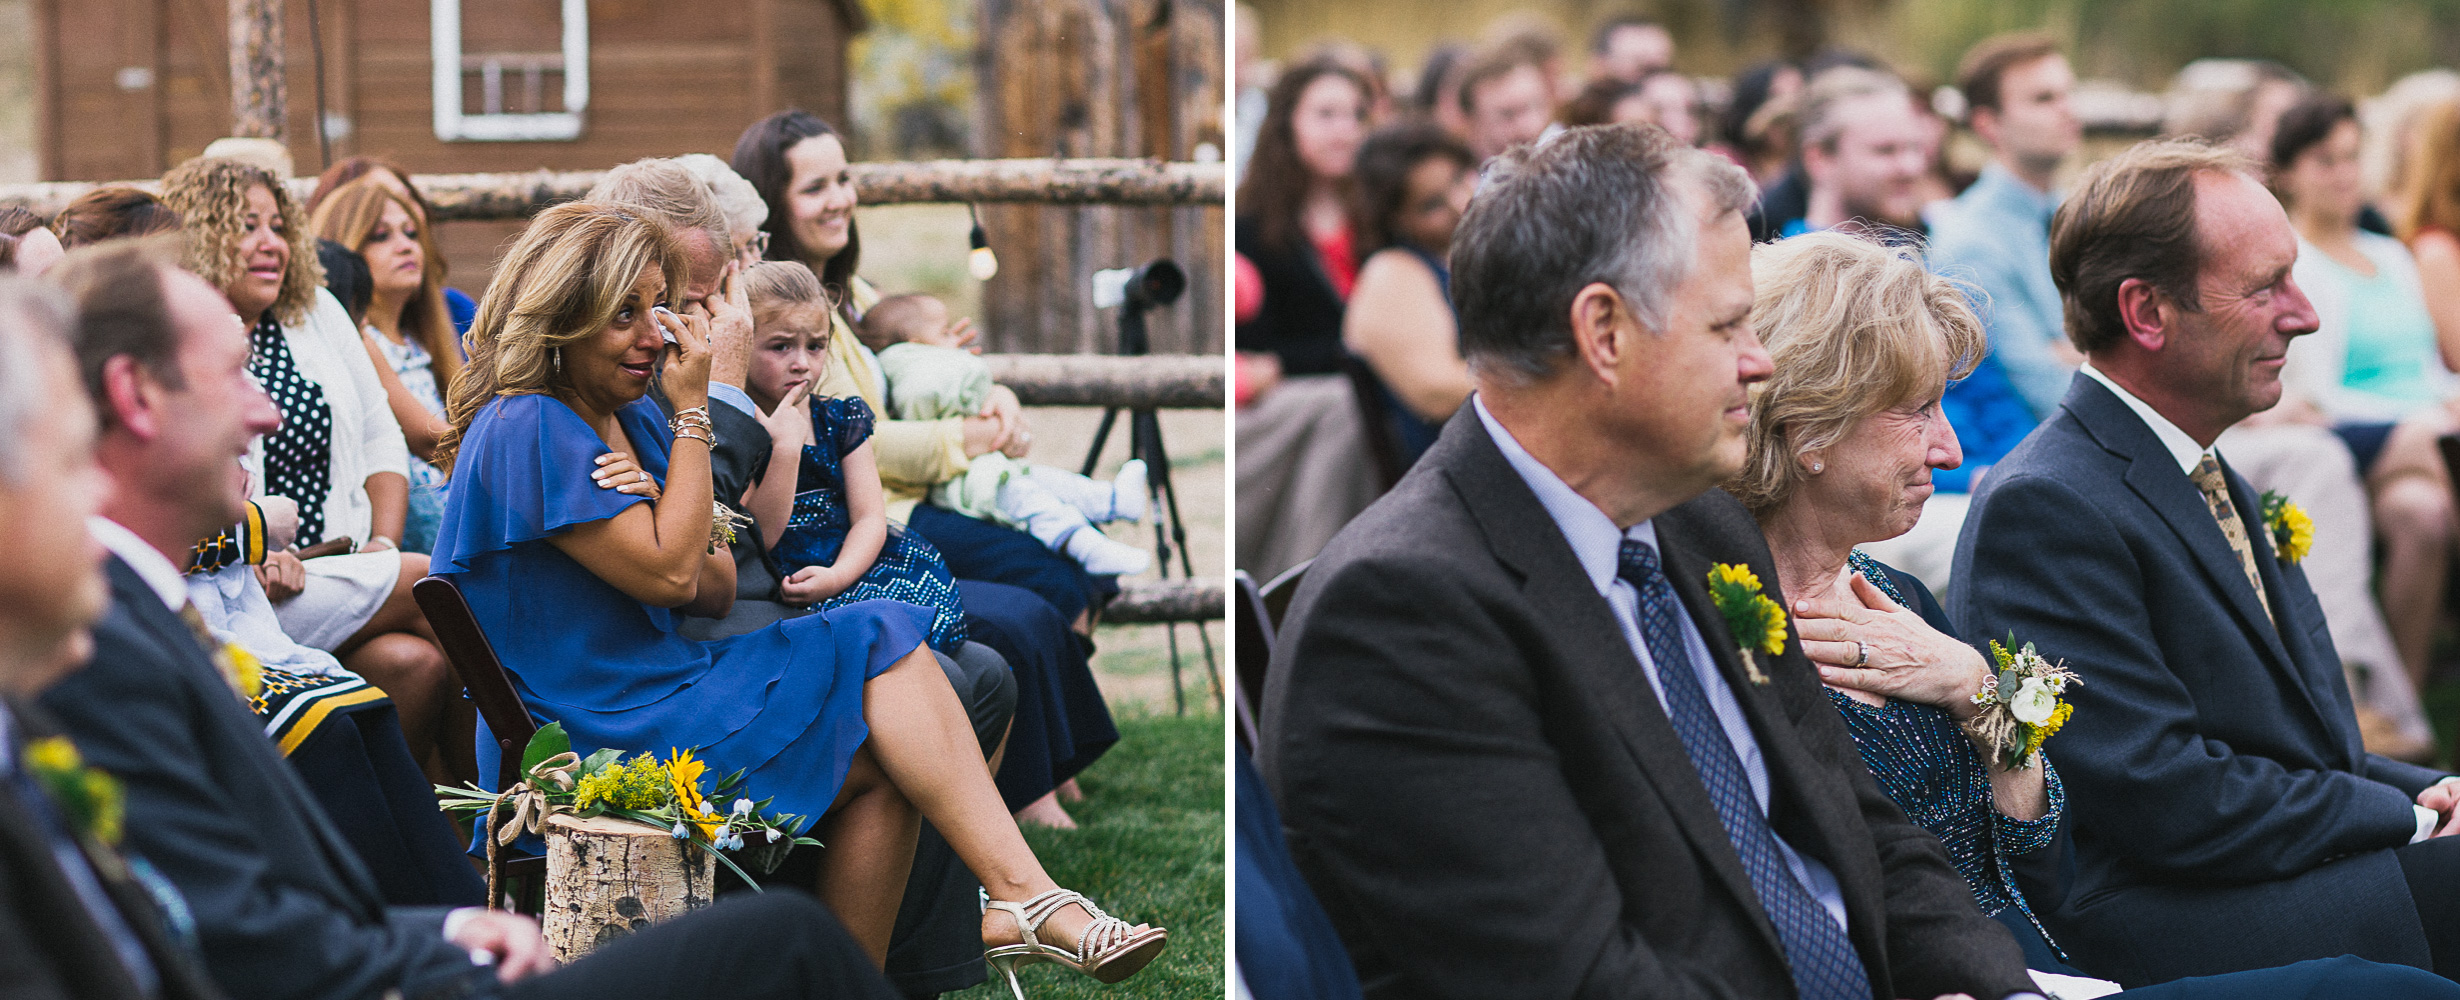 Salt-Lake-City-Wedding-Photographer-Utah-011.jpg